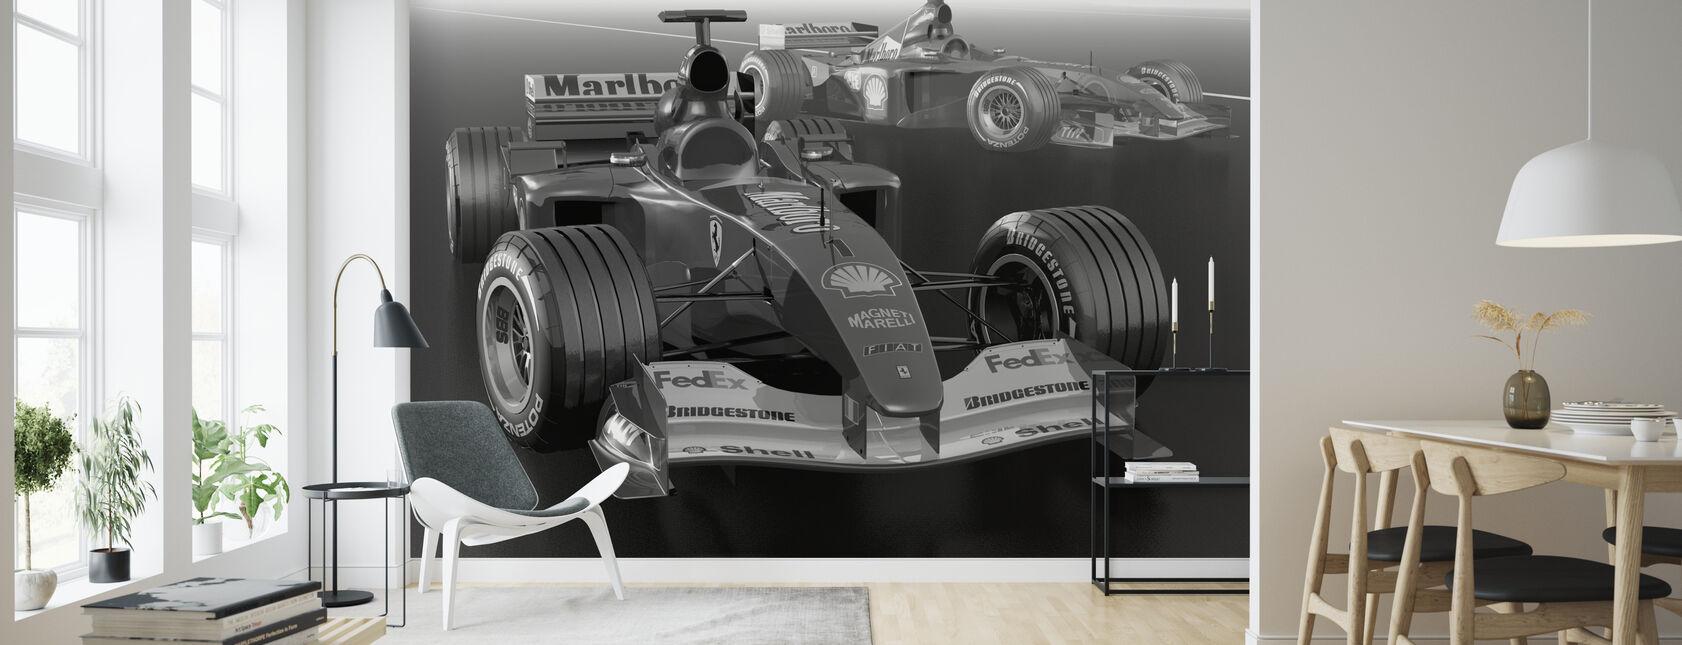 Classic Racing Car BW - Wallpaper - Living Room